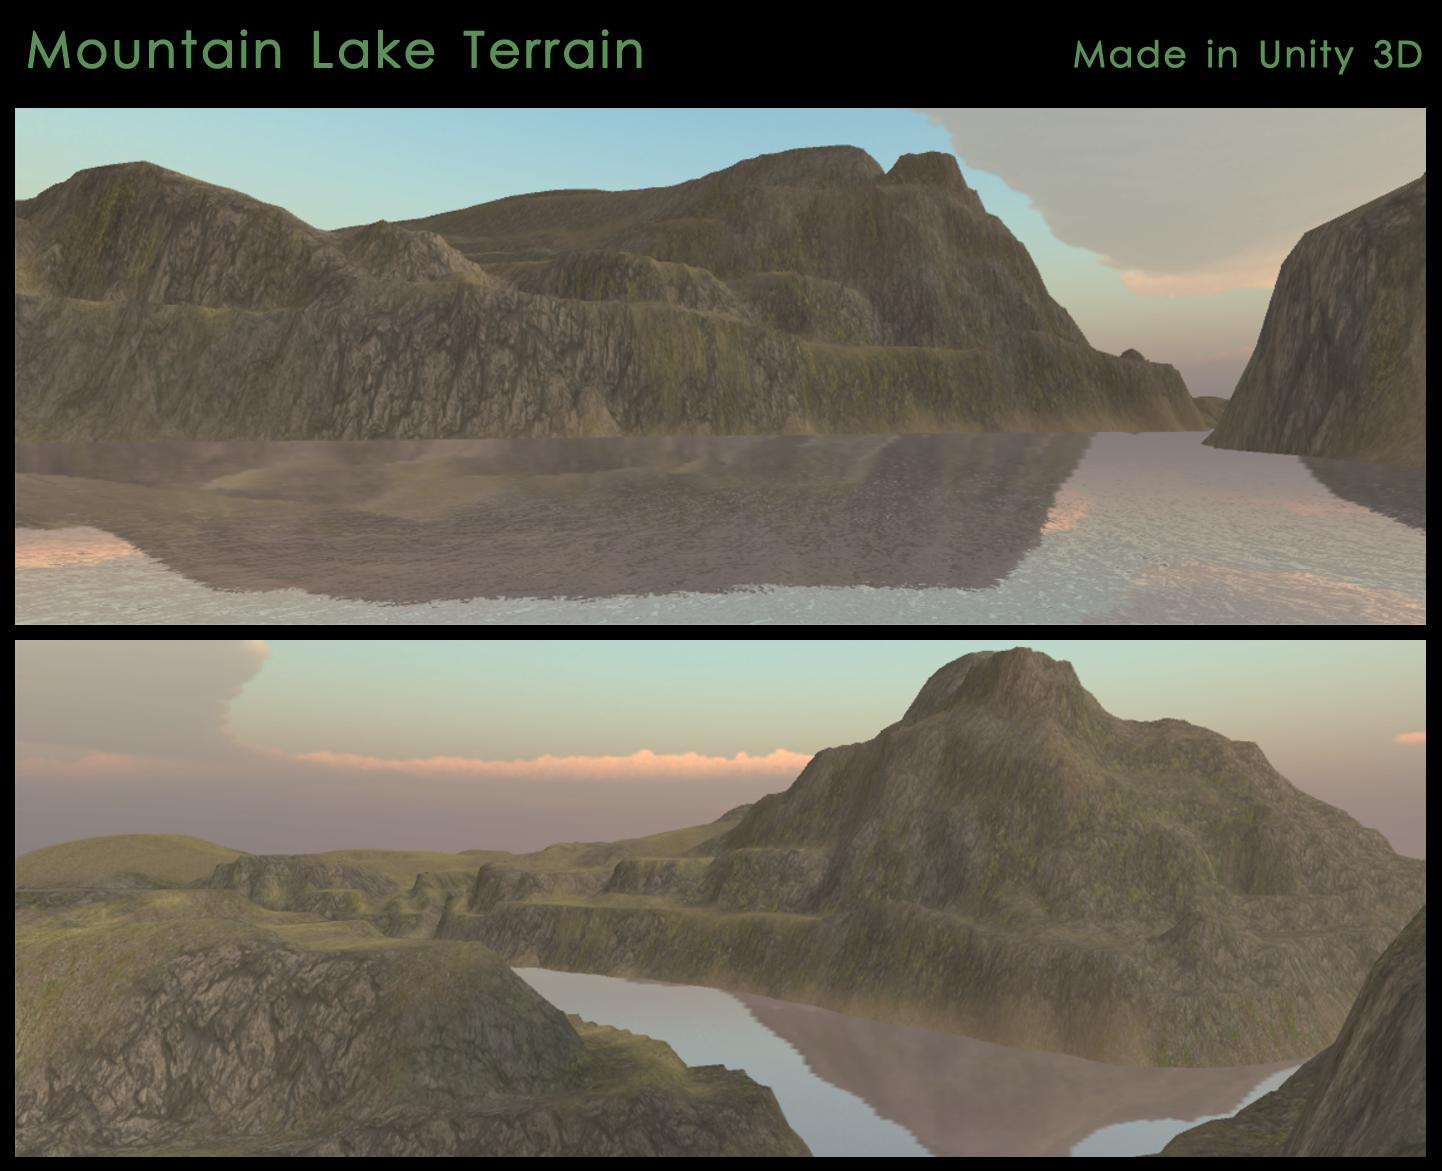 Mountain Lake Terrain